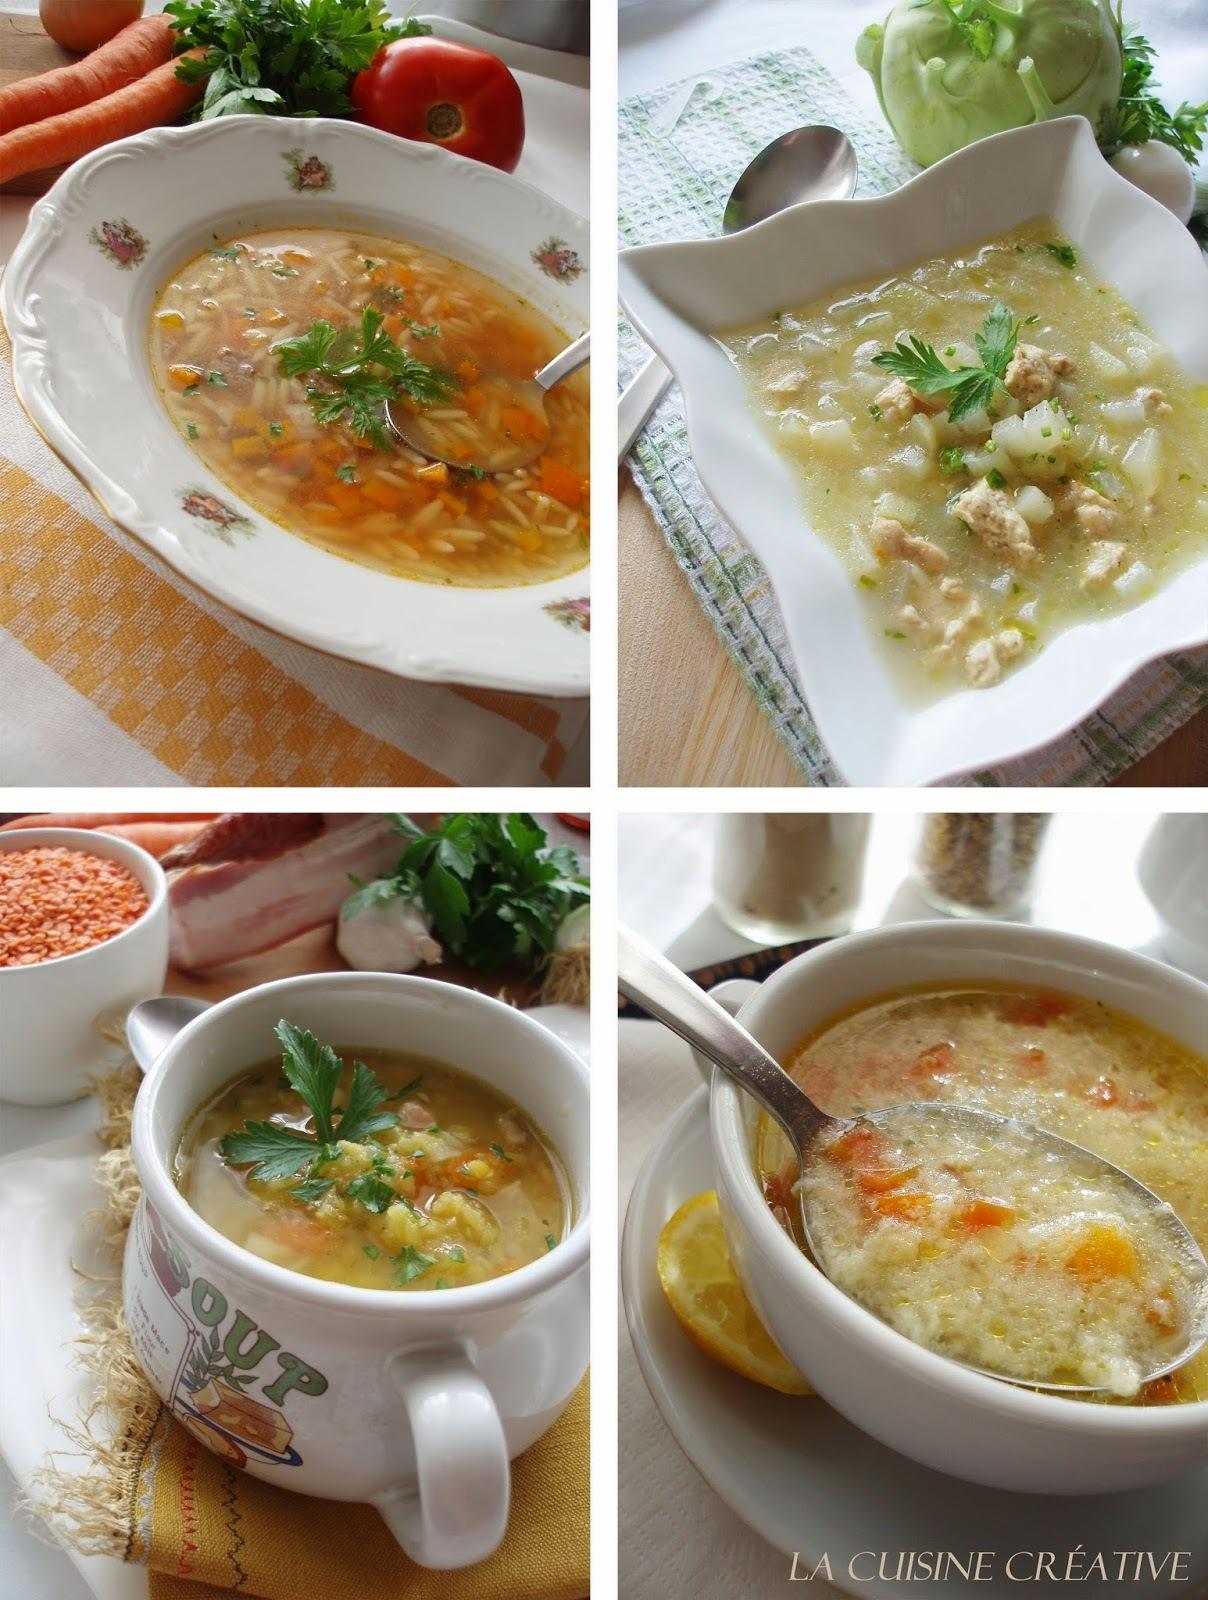 Ukusne supice: 4 recepta